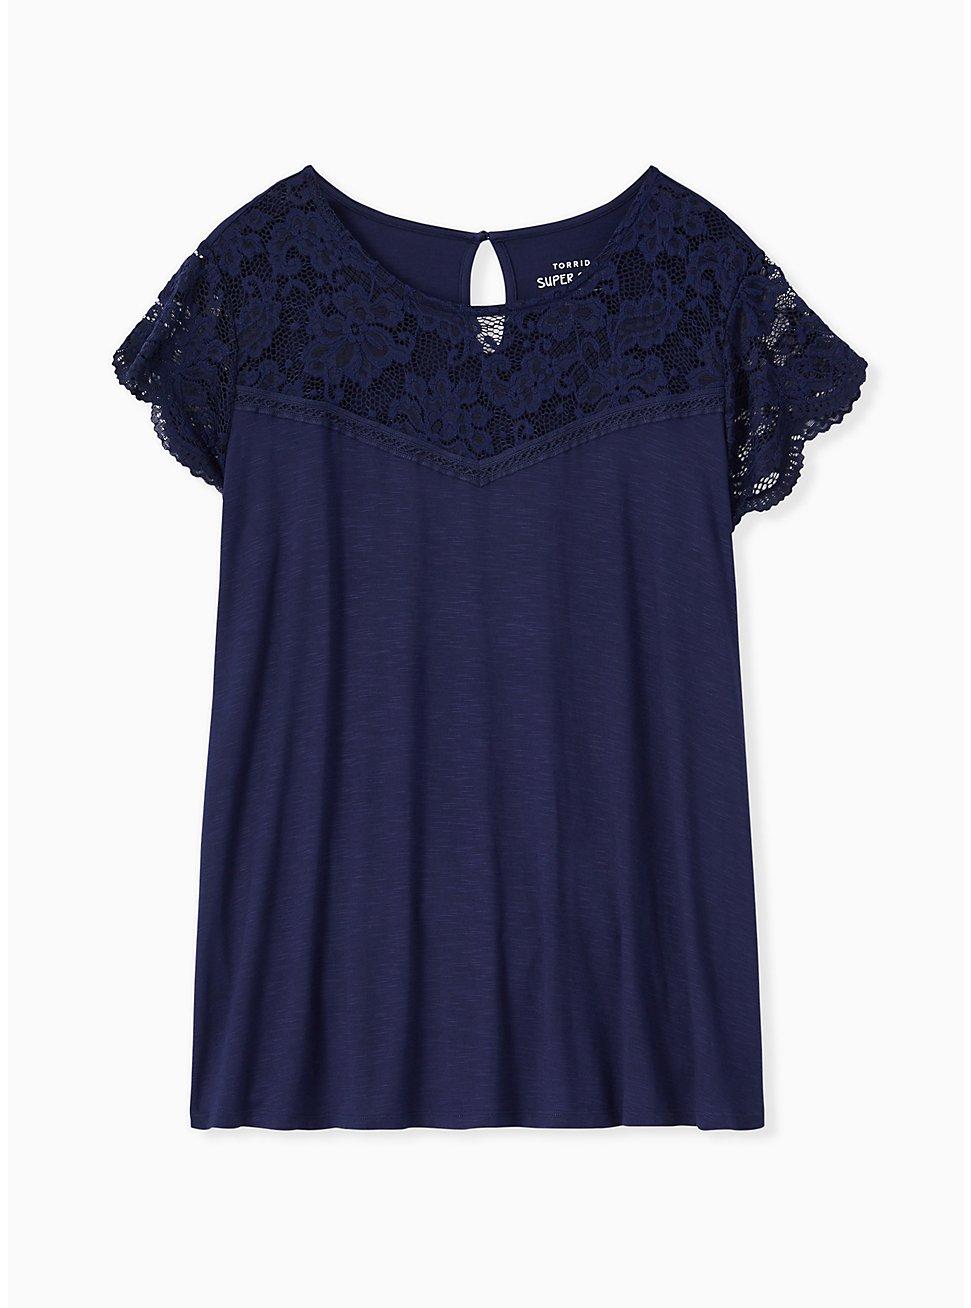 Plus Size Super Soft Navy Lace Sleeve Top, NAVY, hi-res